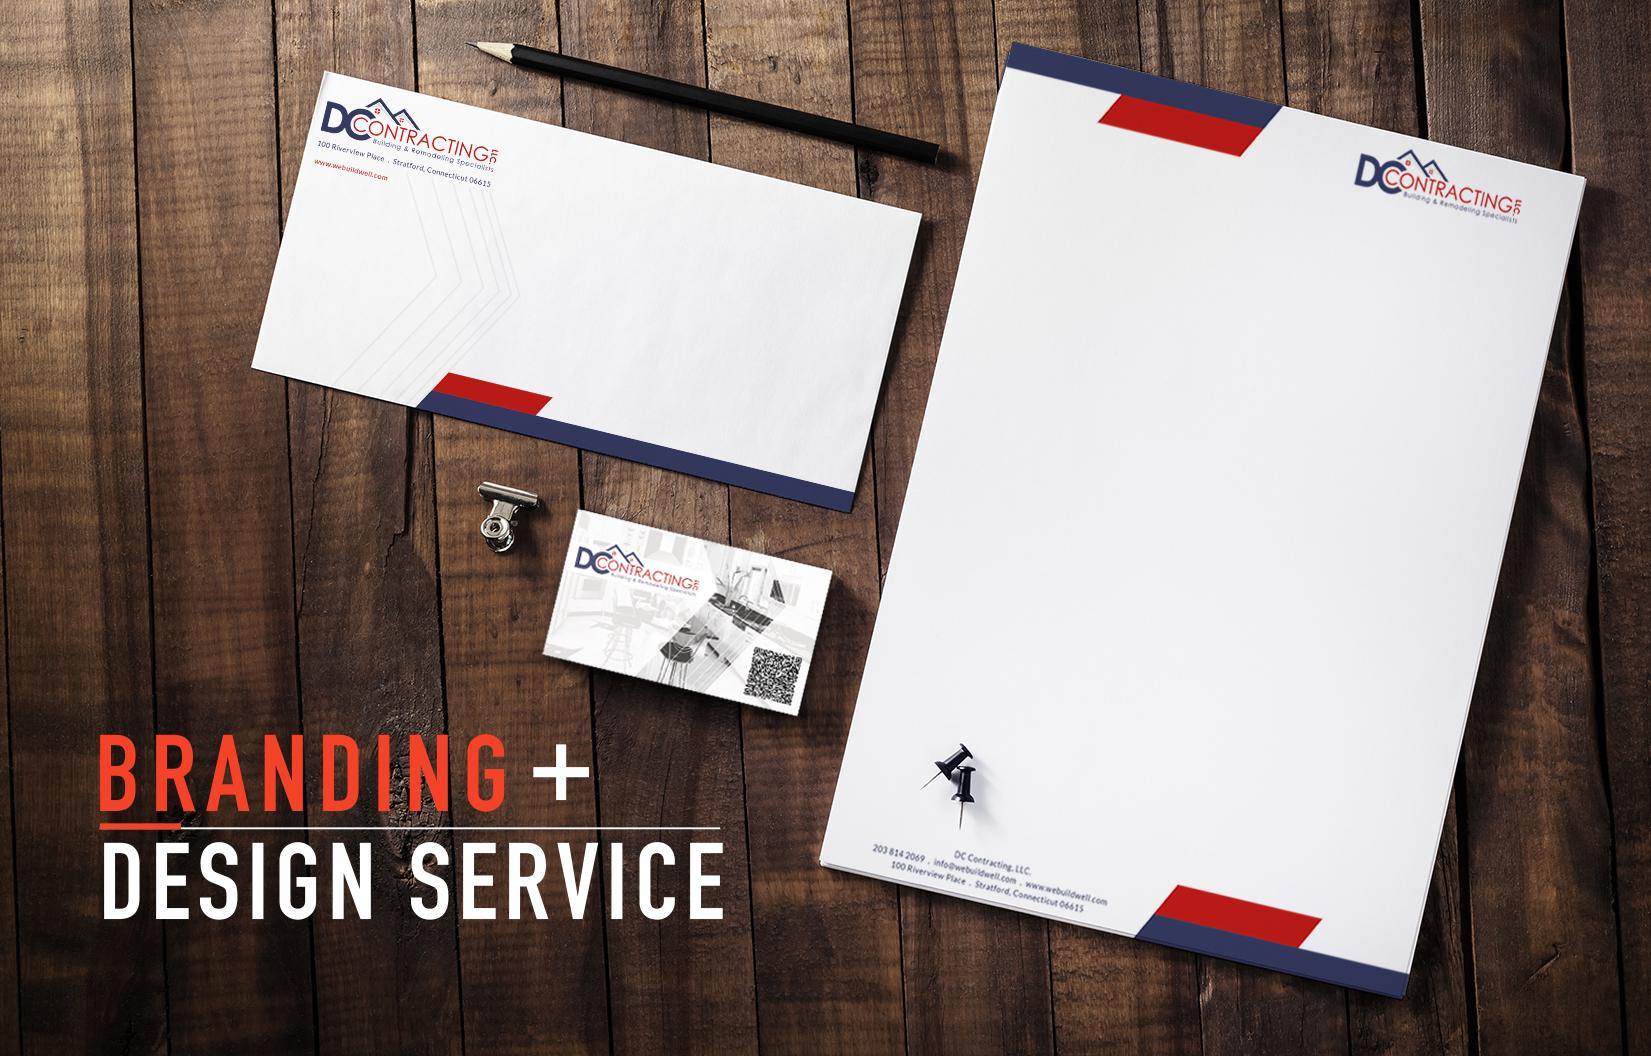 Branding + Design Services